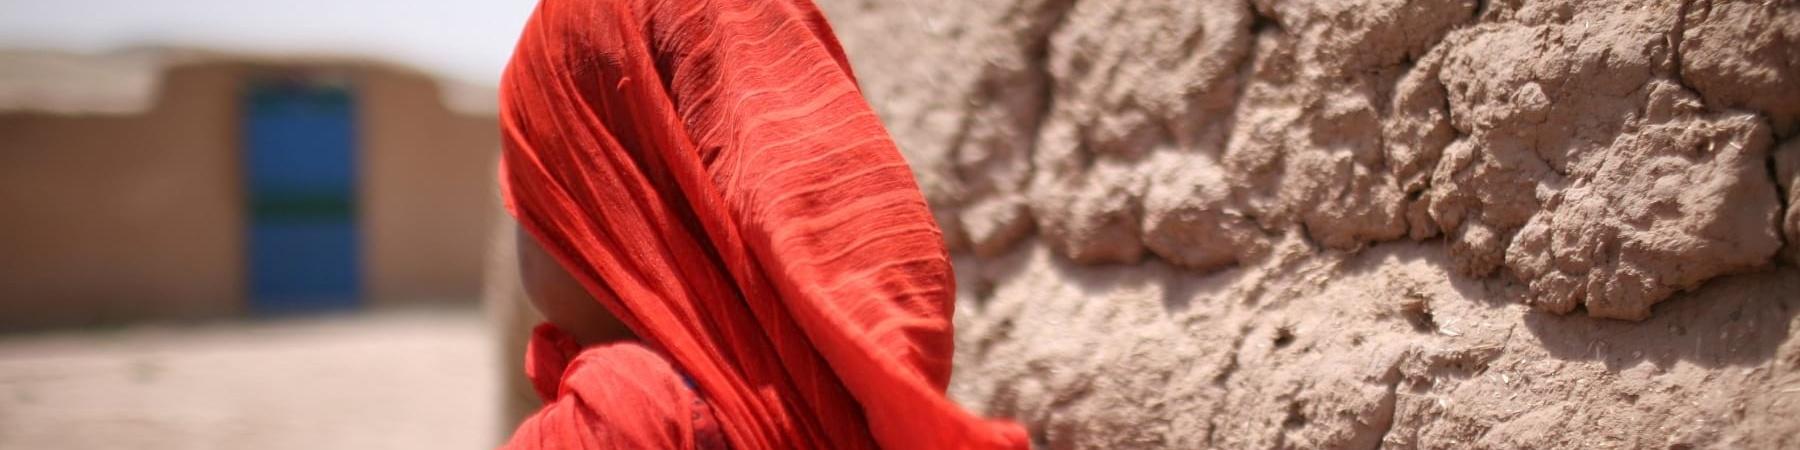 Bambina afghana di spalle con foulard rosso